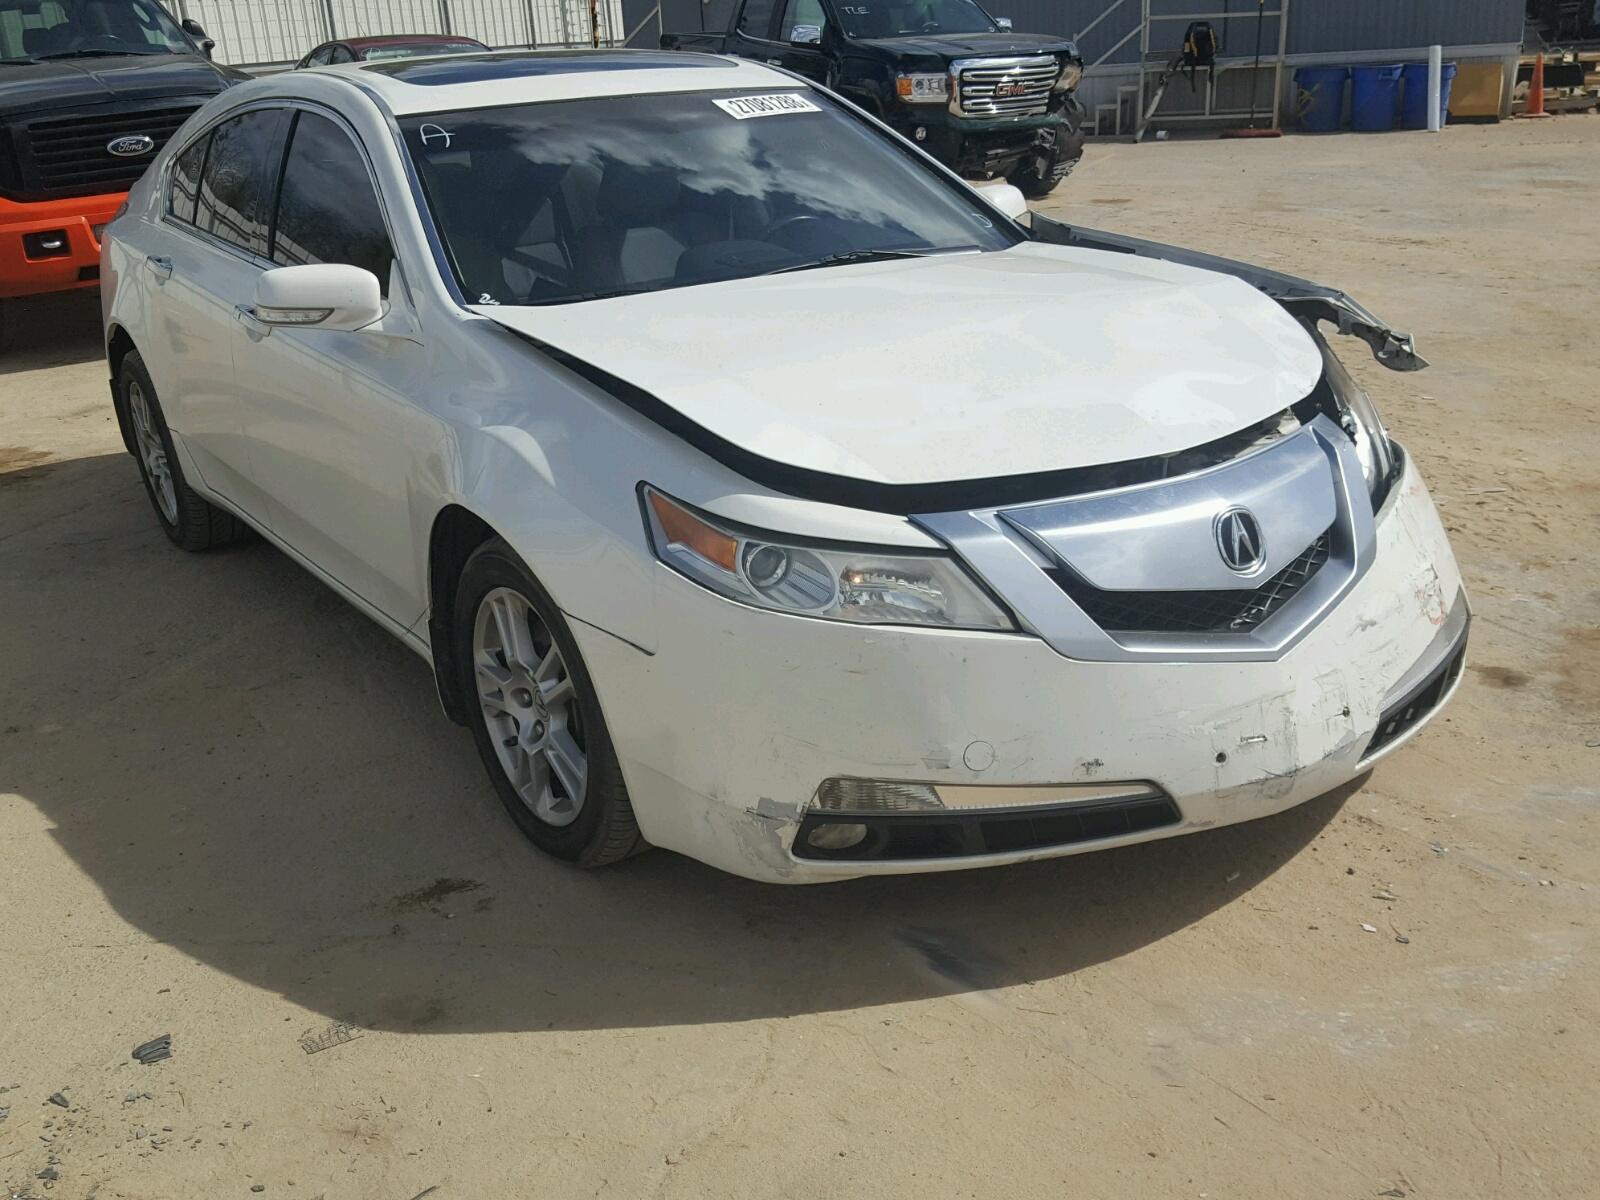 dallas sale veh tl for danny sedan acura tx in package technology w